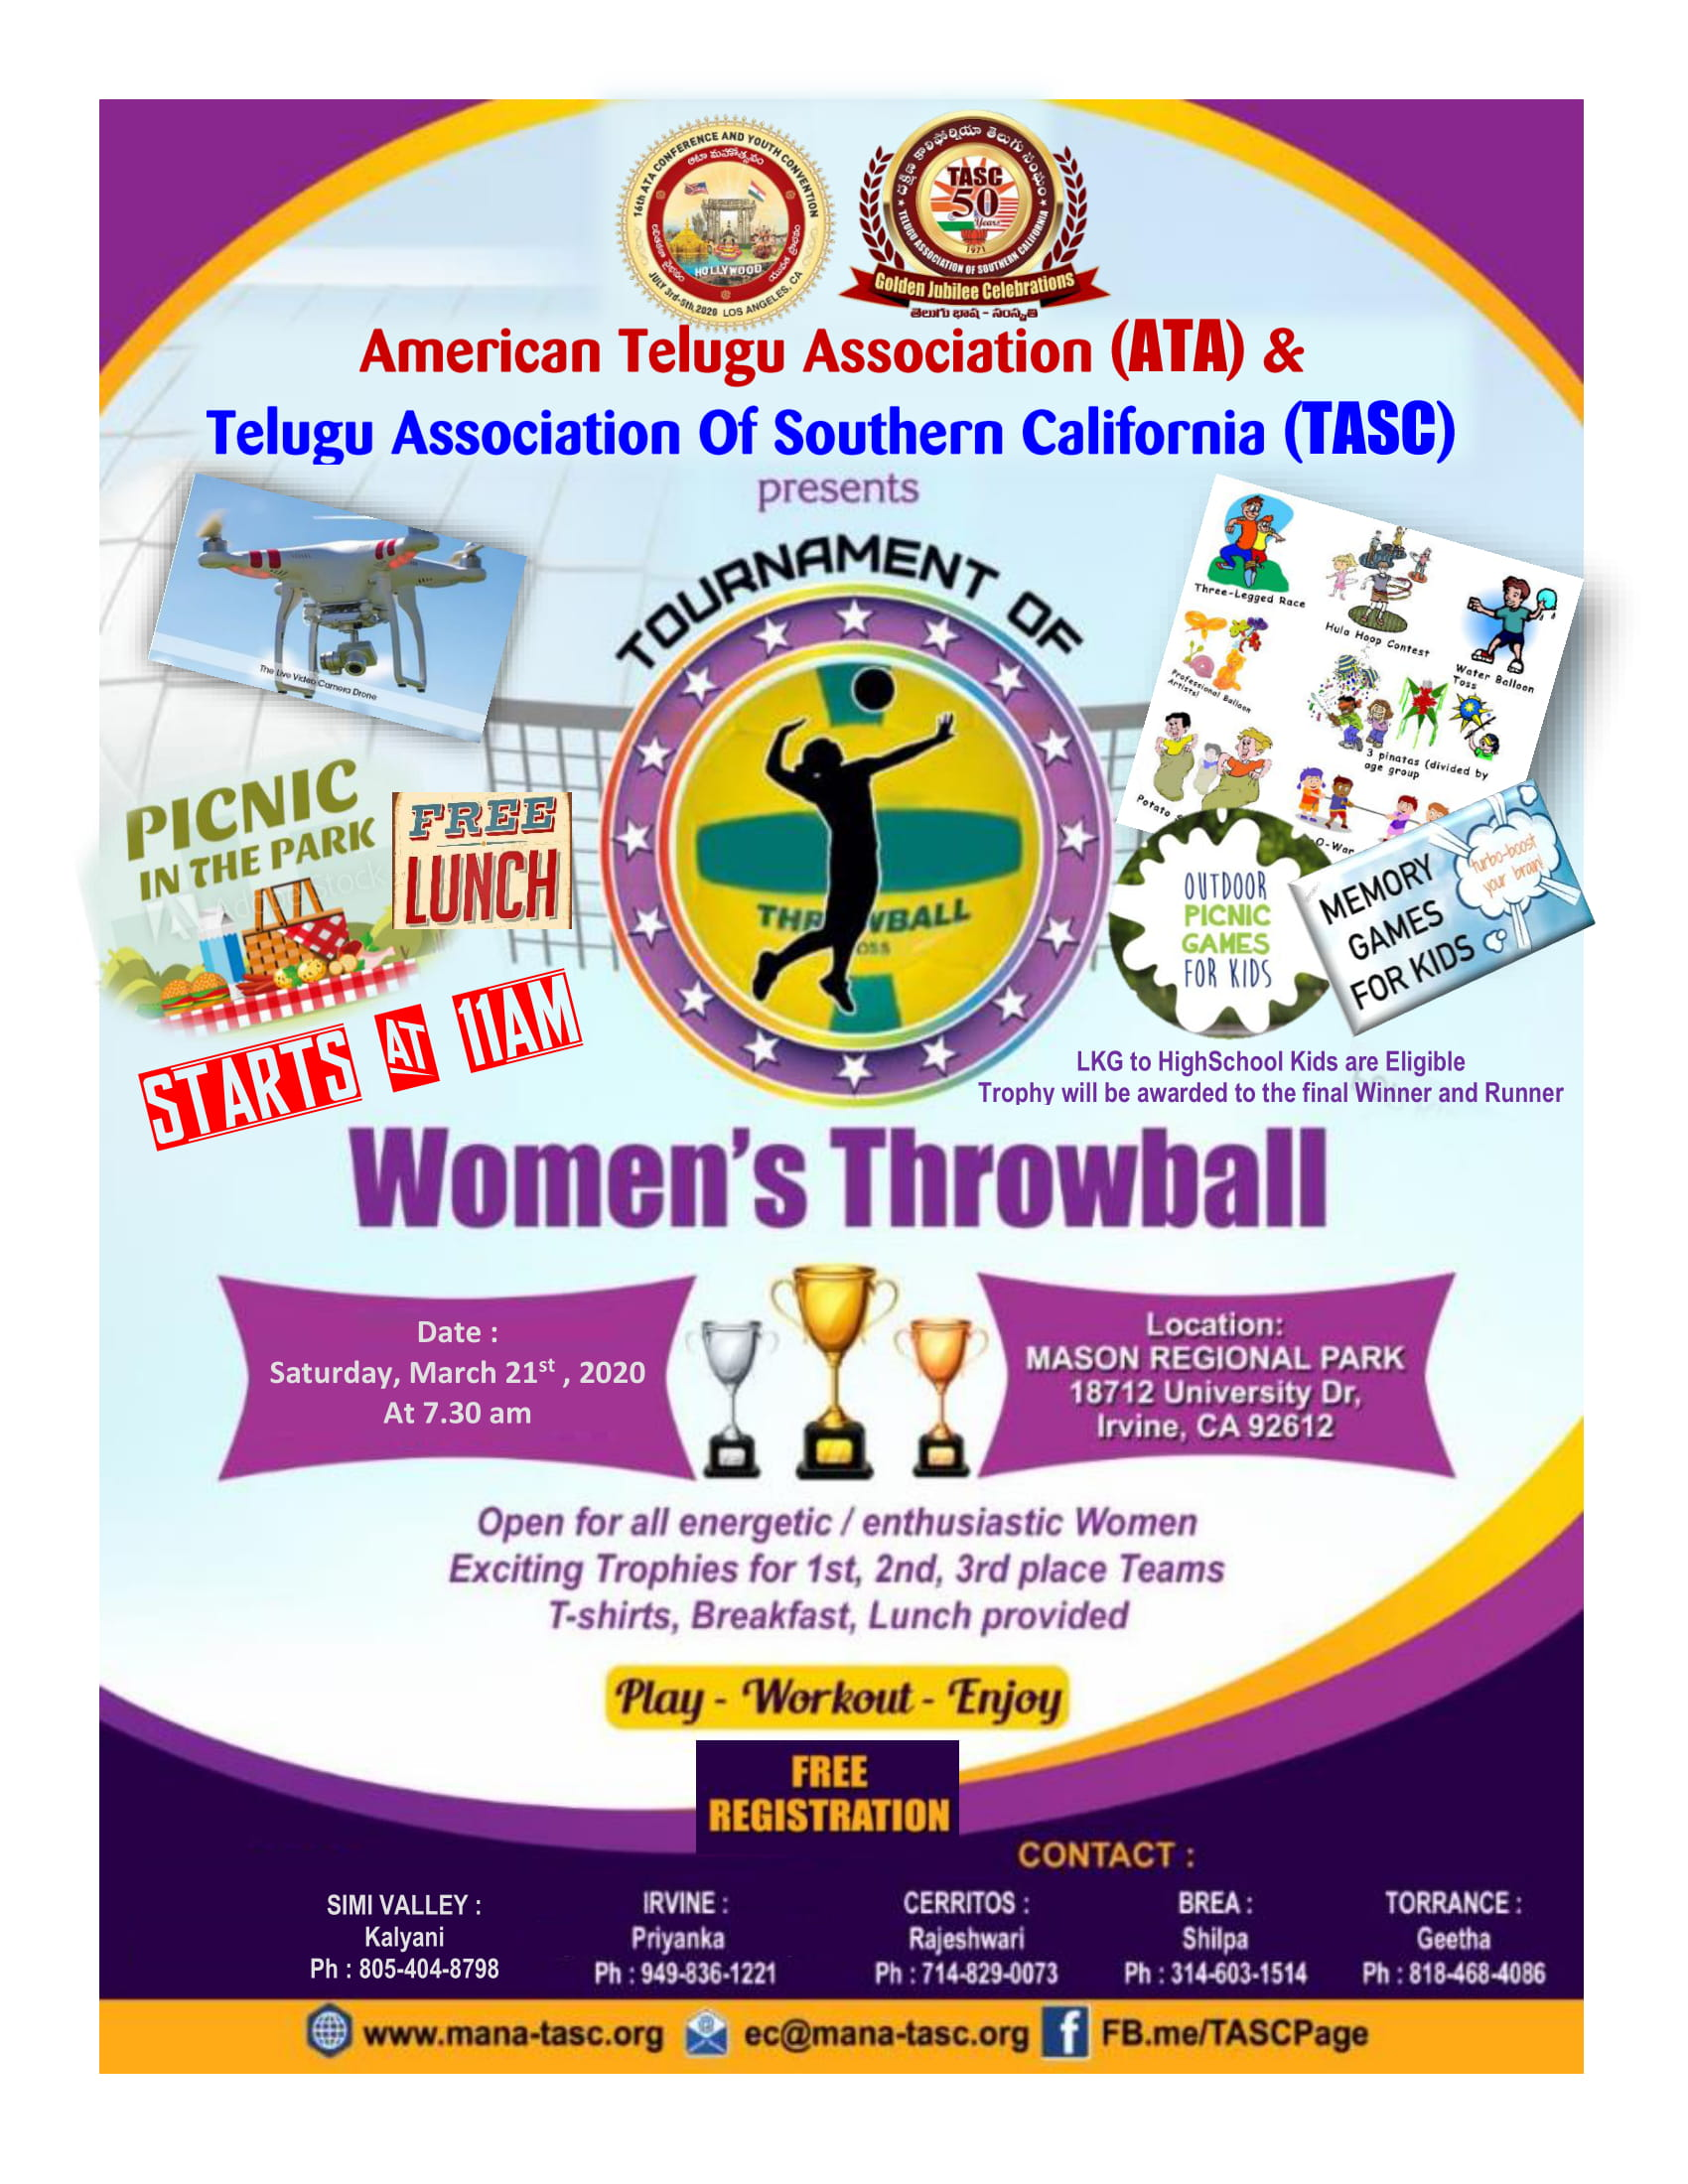 Women's Throwball